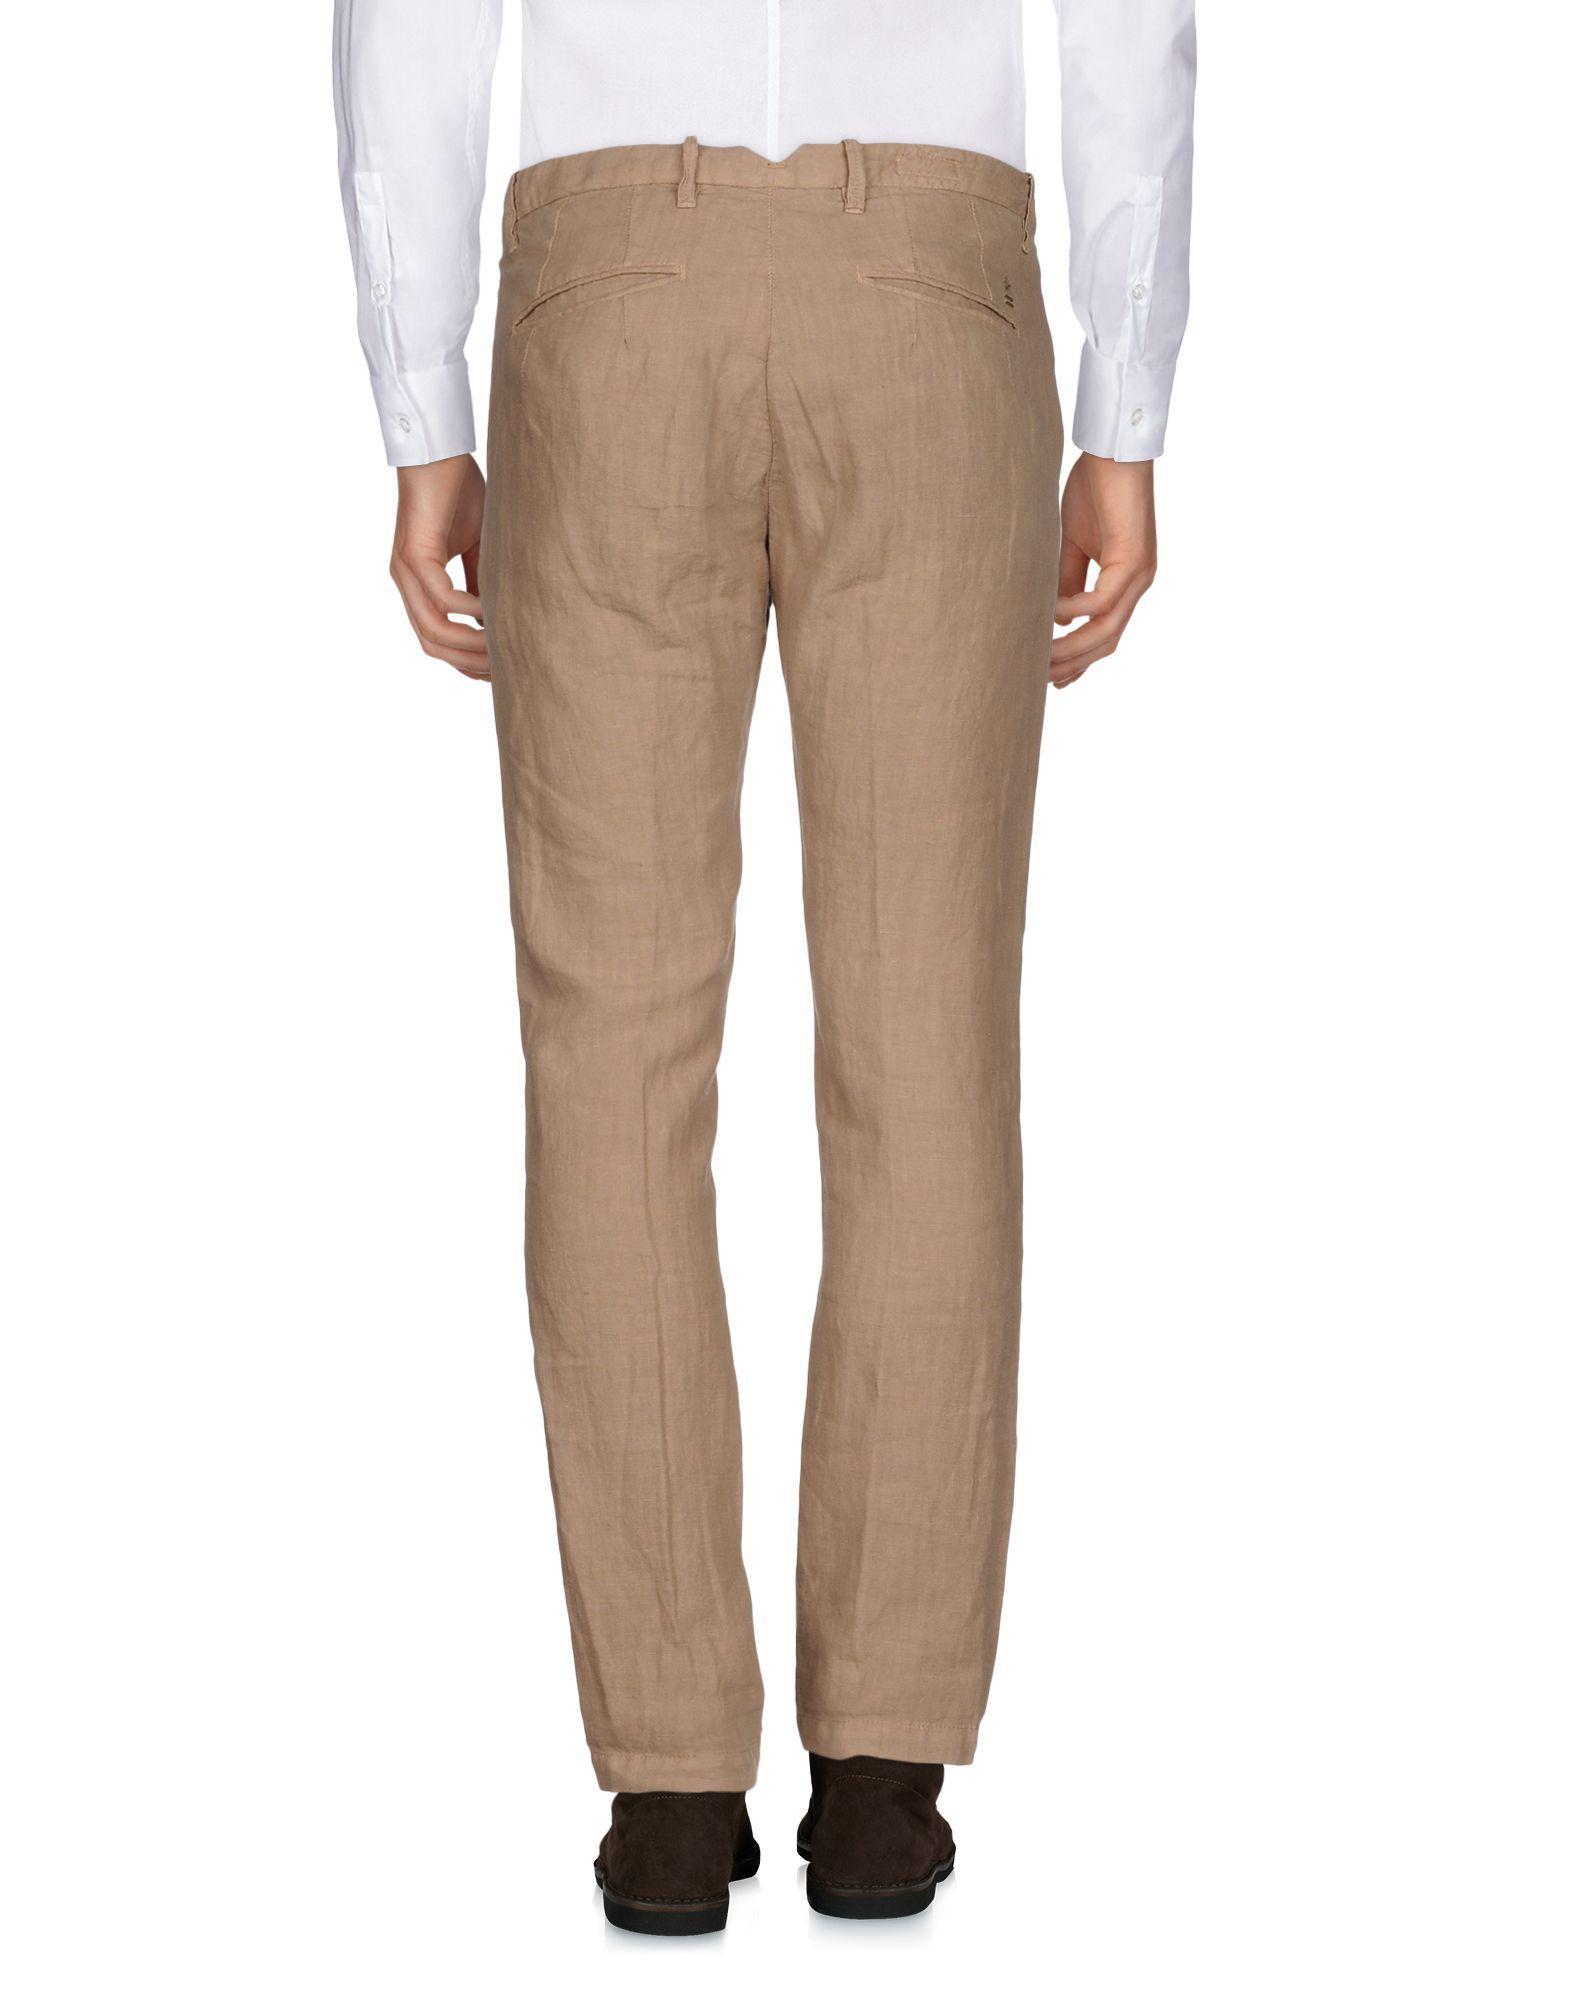 UNIFORM Linen Casual Pants in Sand (Natural) for Men